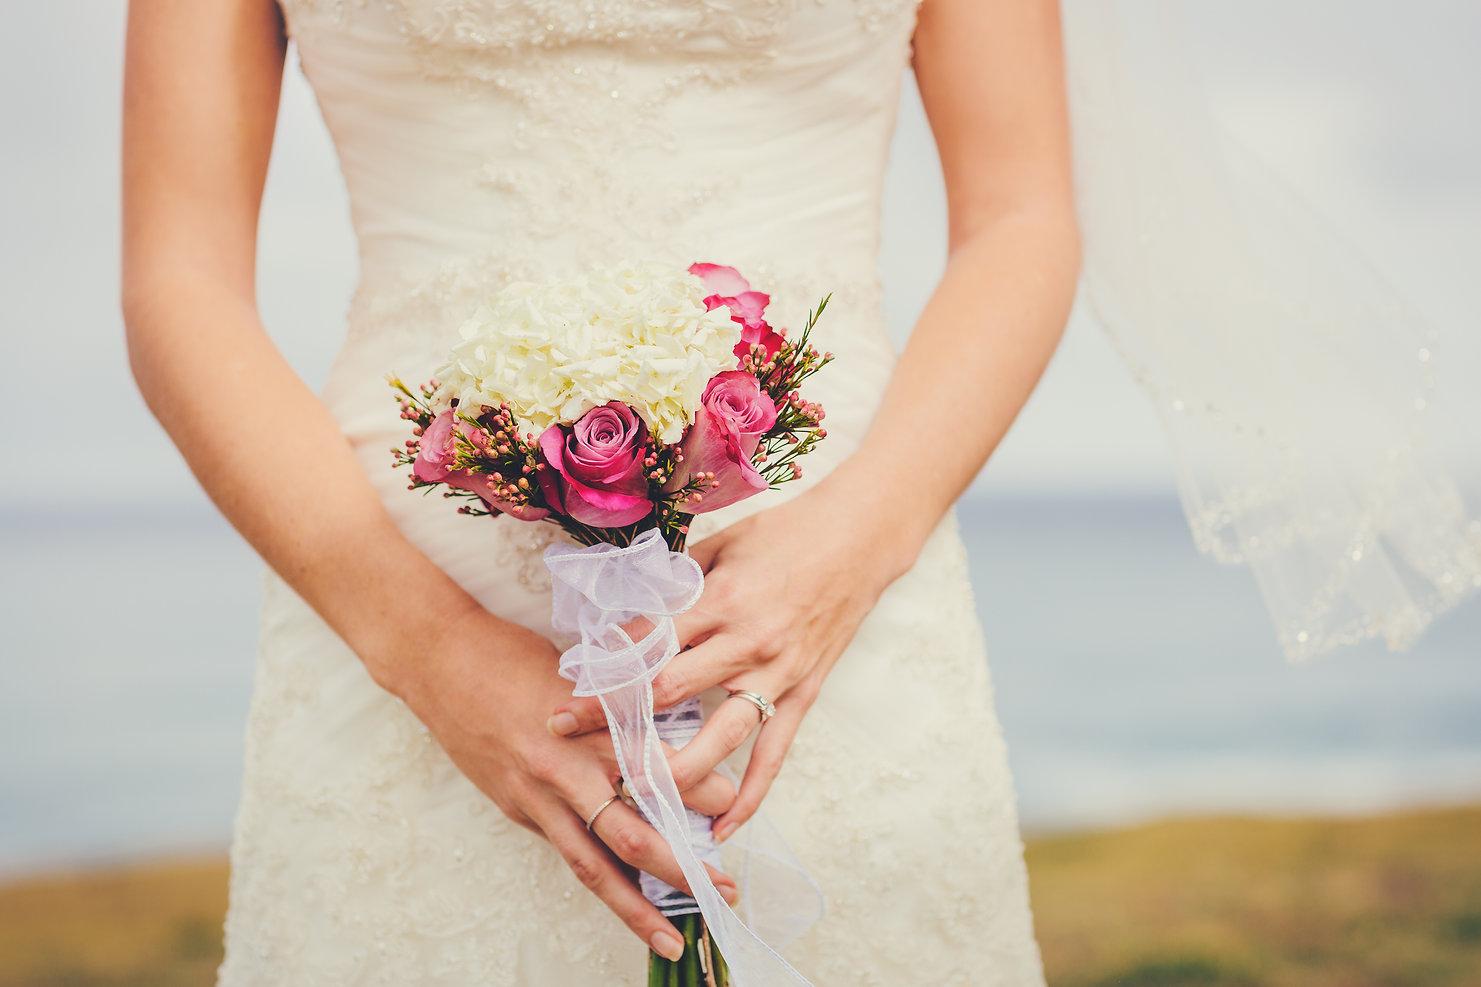 bride-PRCA57L.jpg